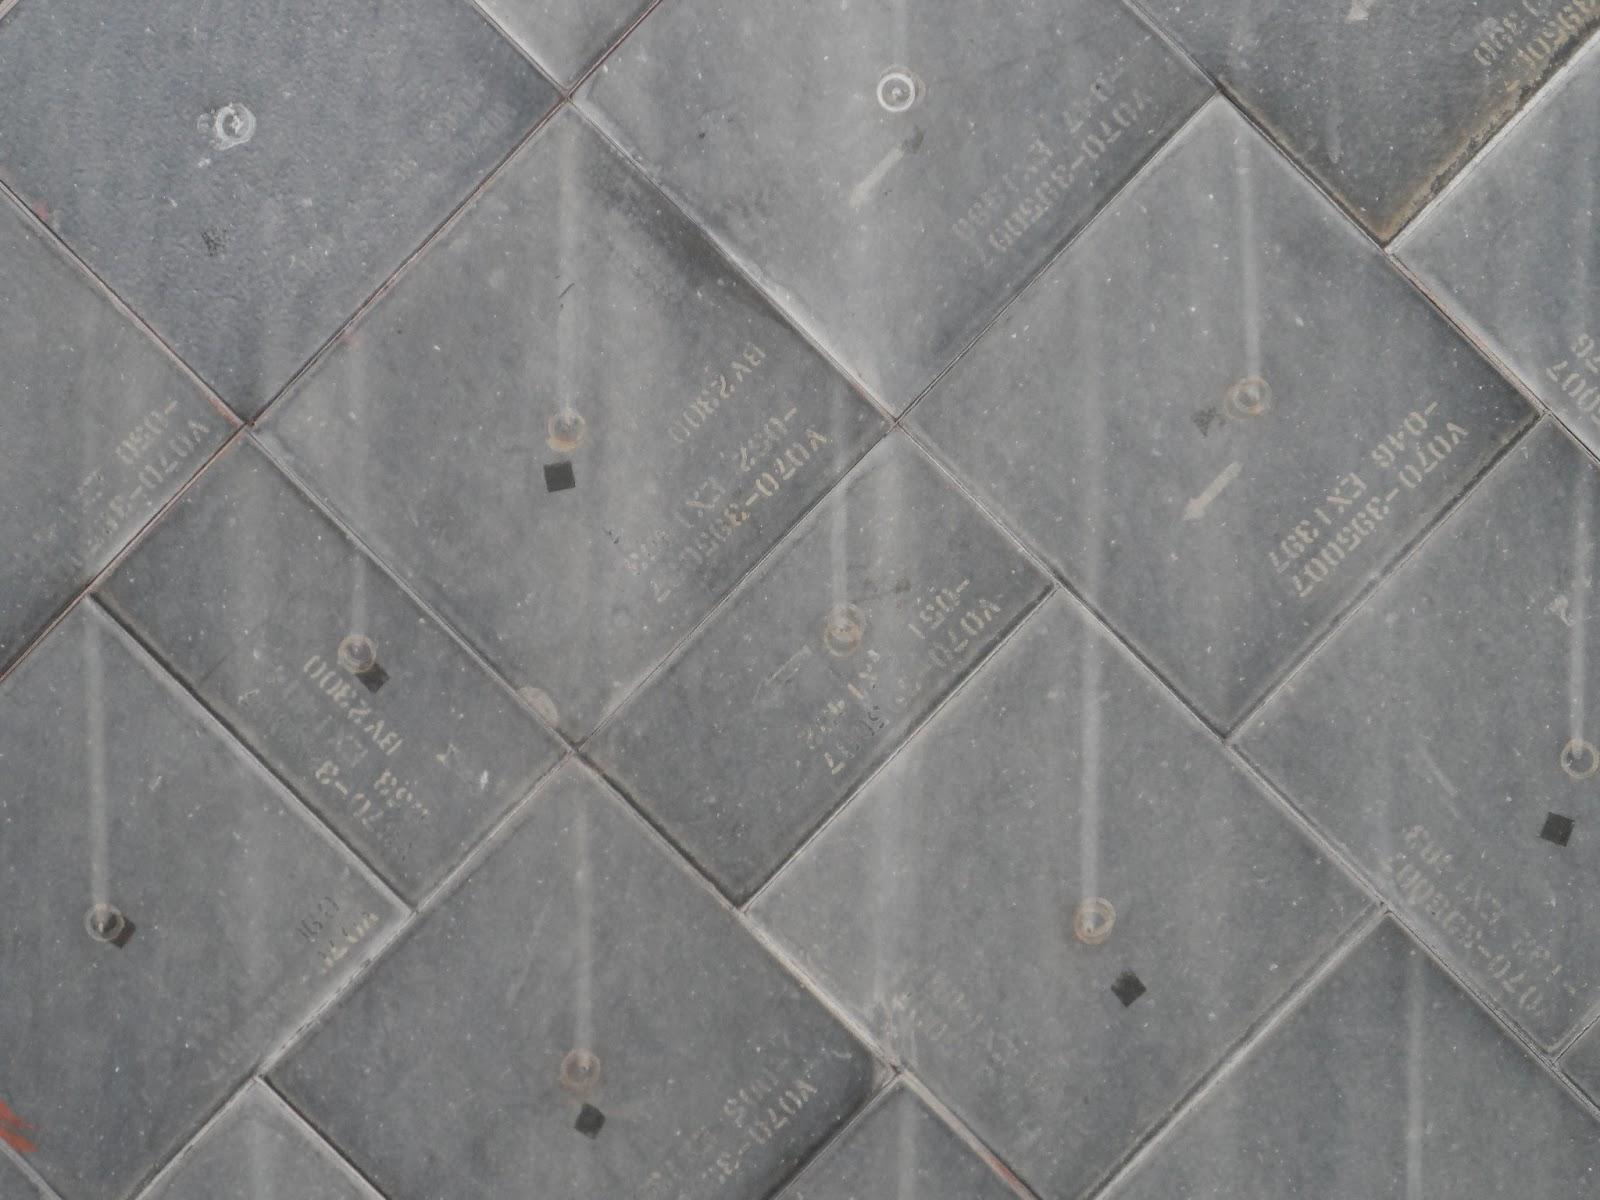 space shuttle tile glue - photo #3